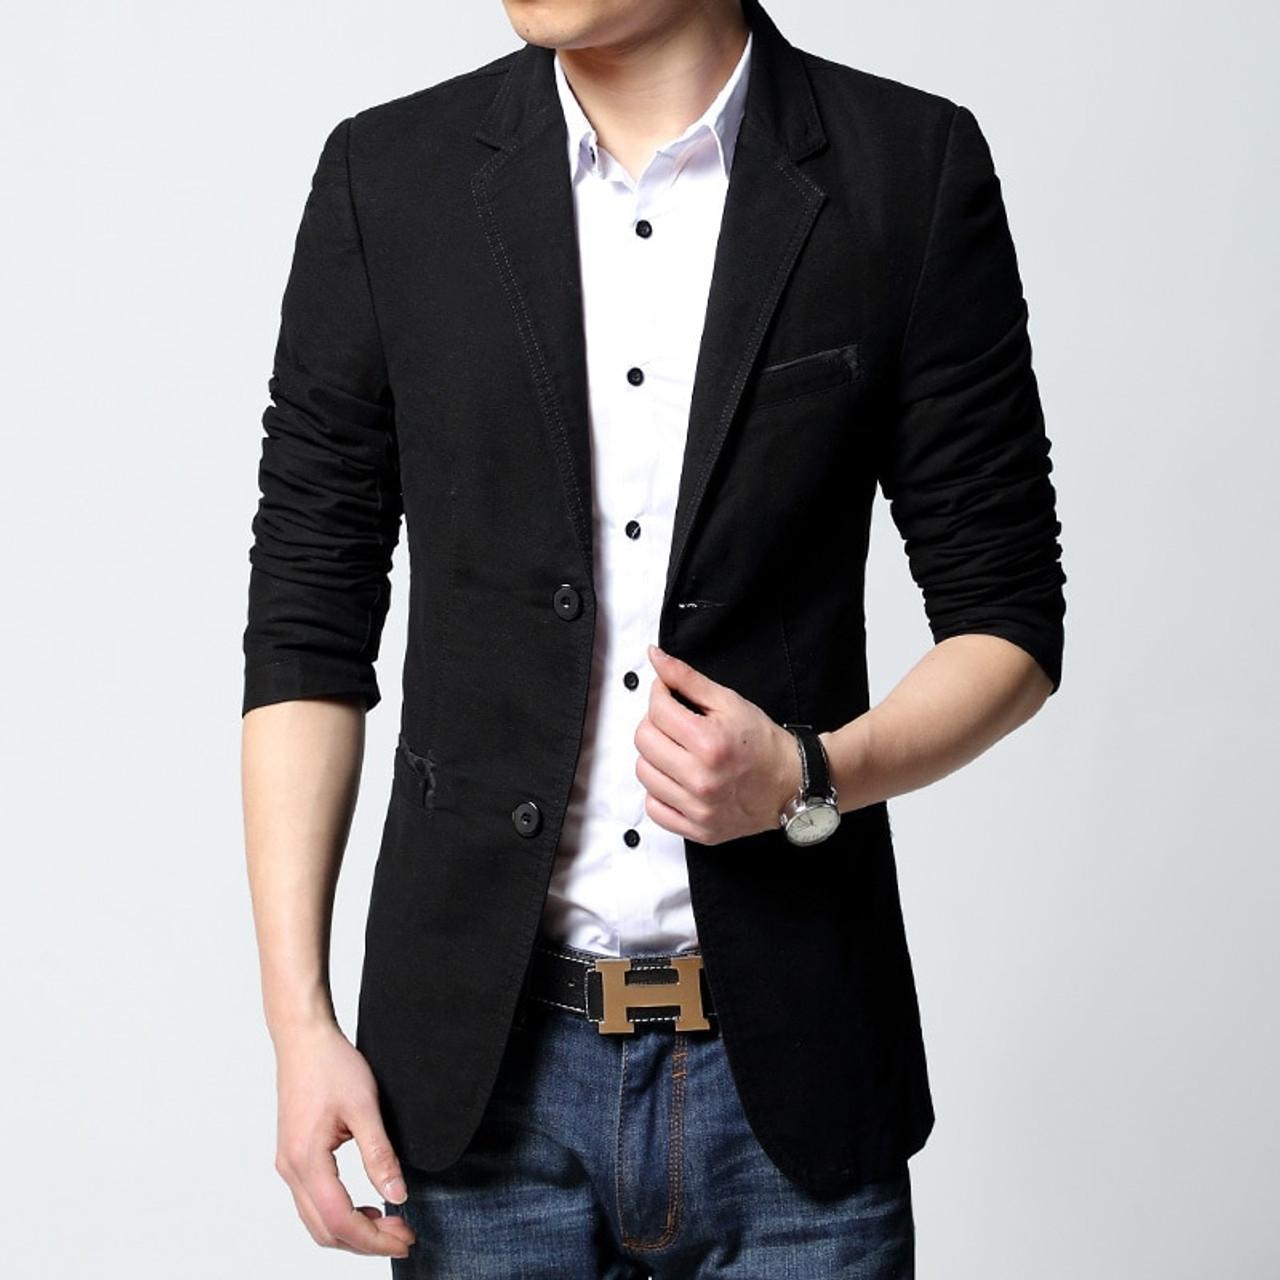 46e541c88a662 ... 2019 brand casual jacket terno masculino Men s Slim Fit blazer Black  Coat Fashion One button khaki ...